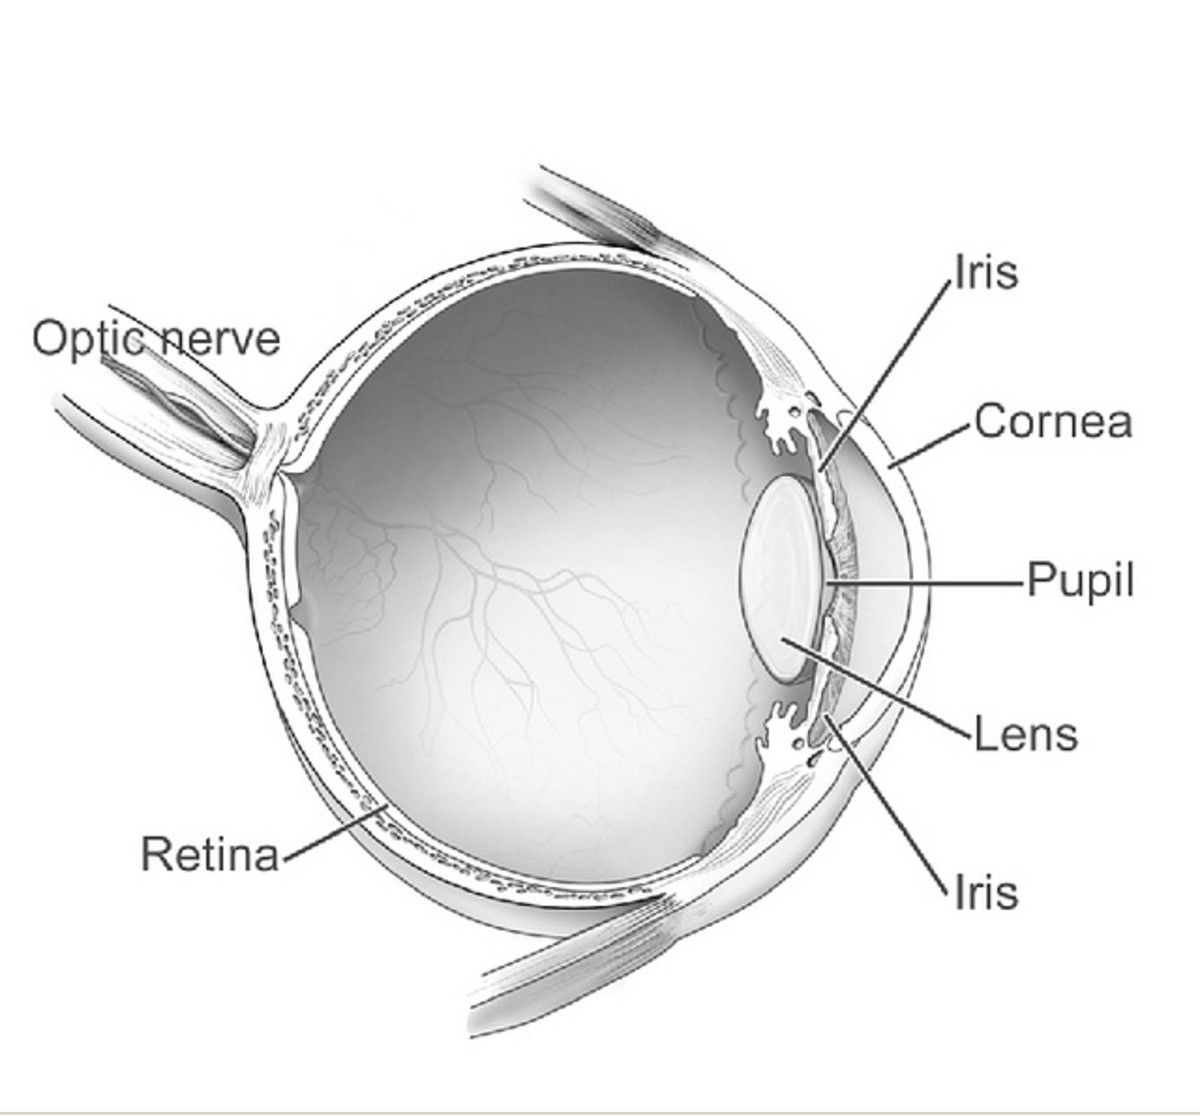 Diagram of the Eye